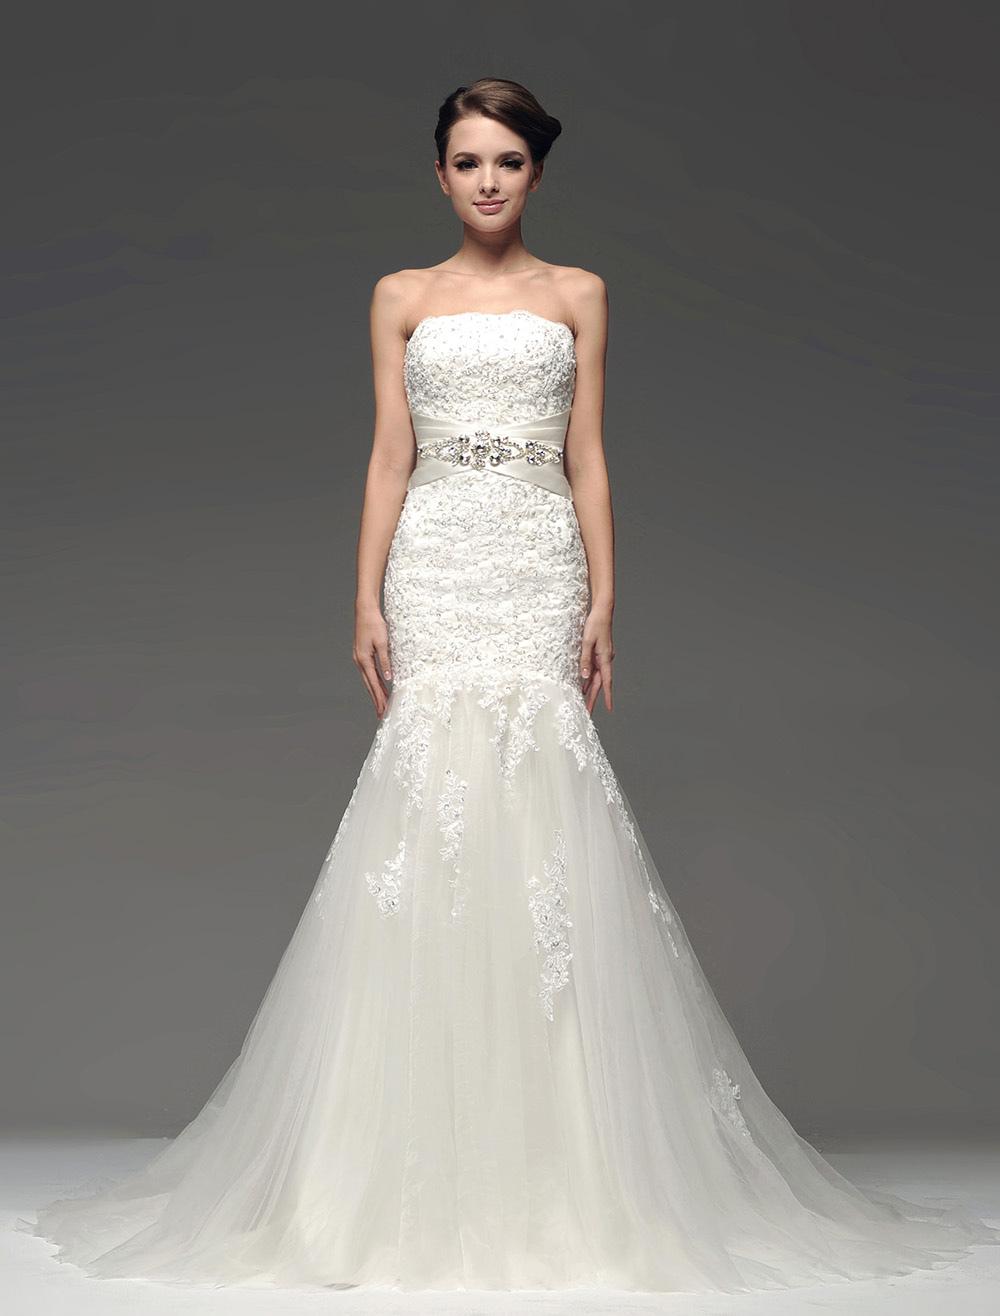 Ivory Beading Strapless Mermaid Wedding Dress